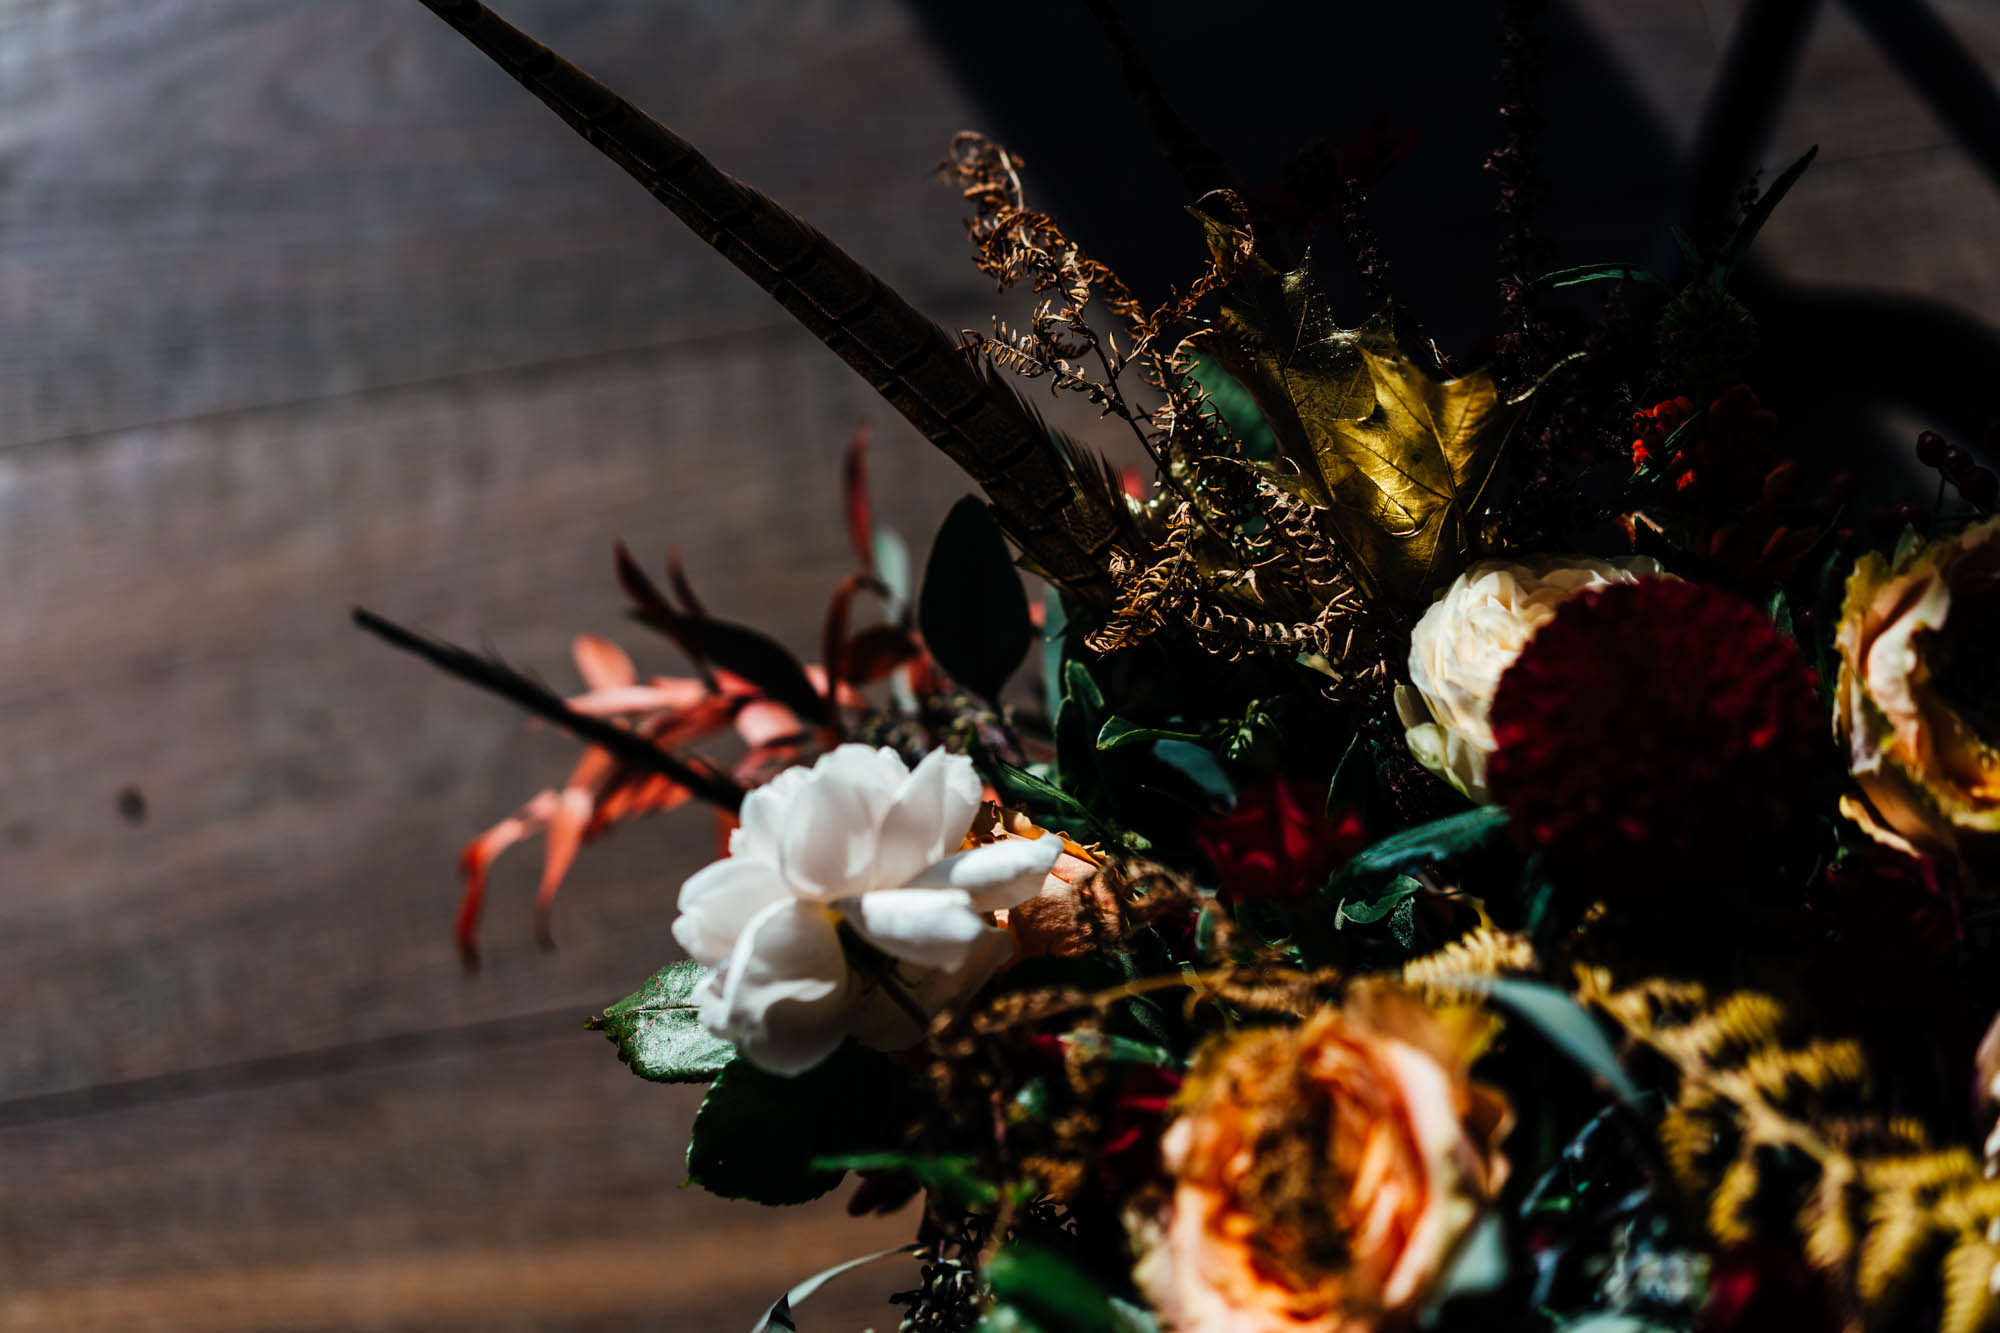 huntsmill-farm-wedding-inspiration-2